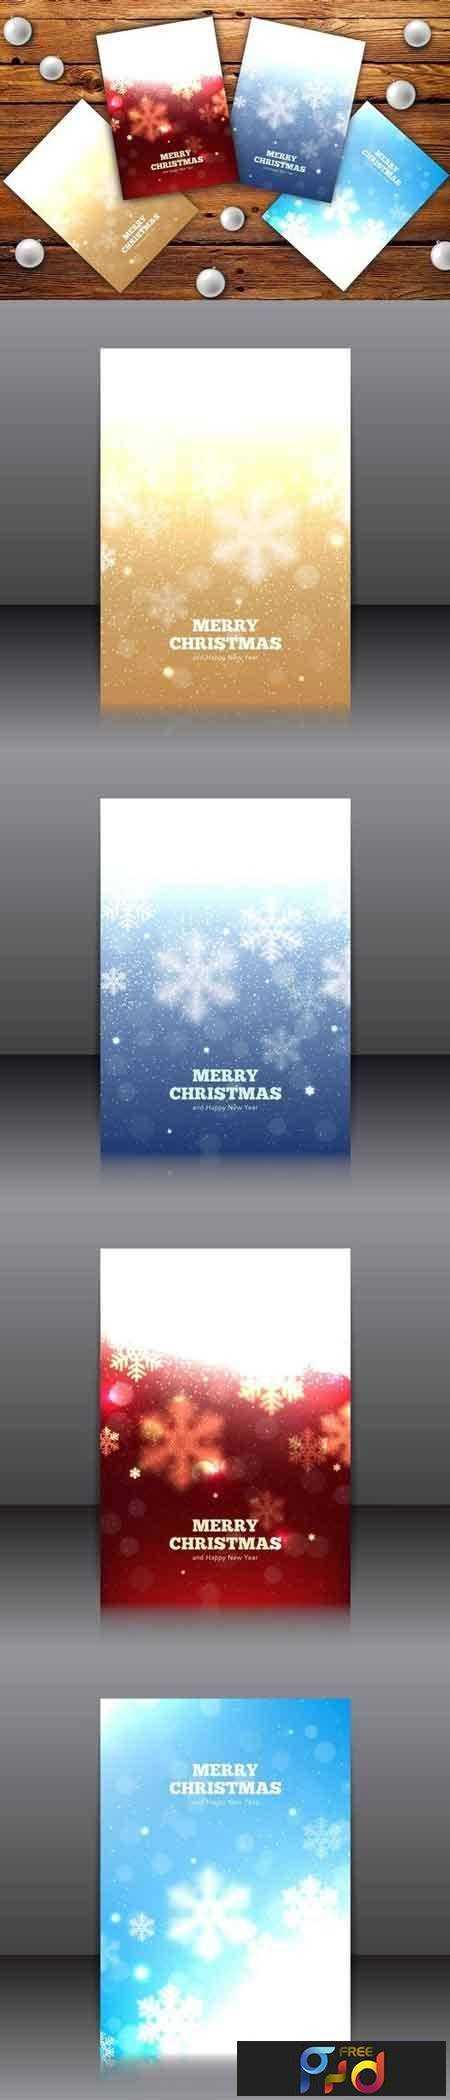 1708202 Set of elegant Christmas flyers 374779 1